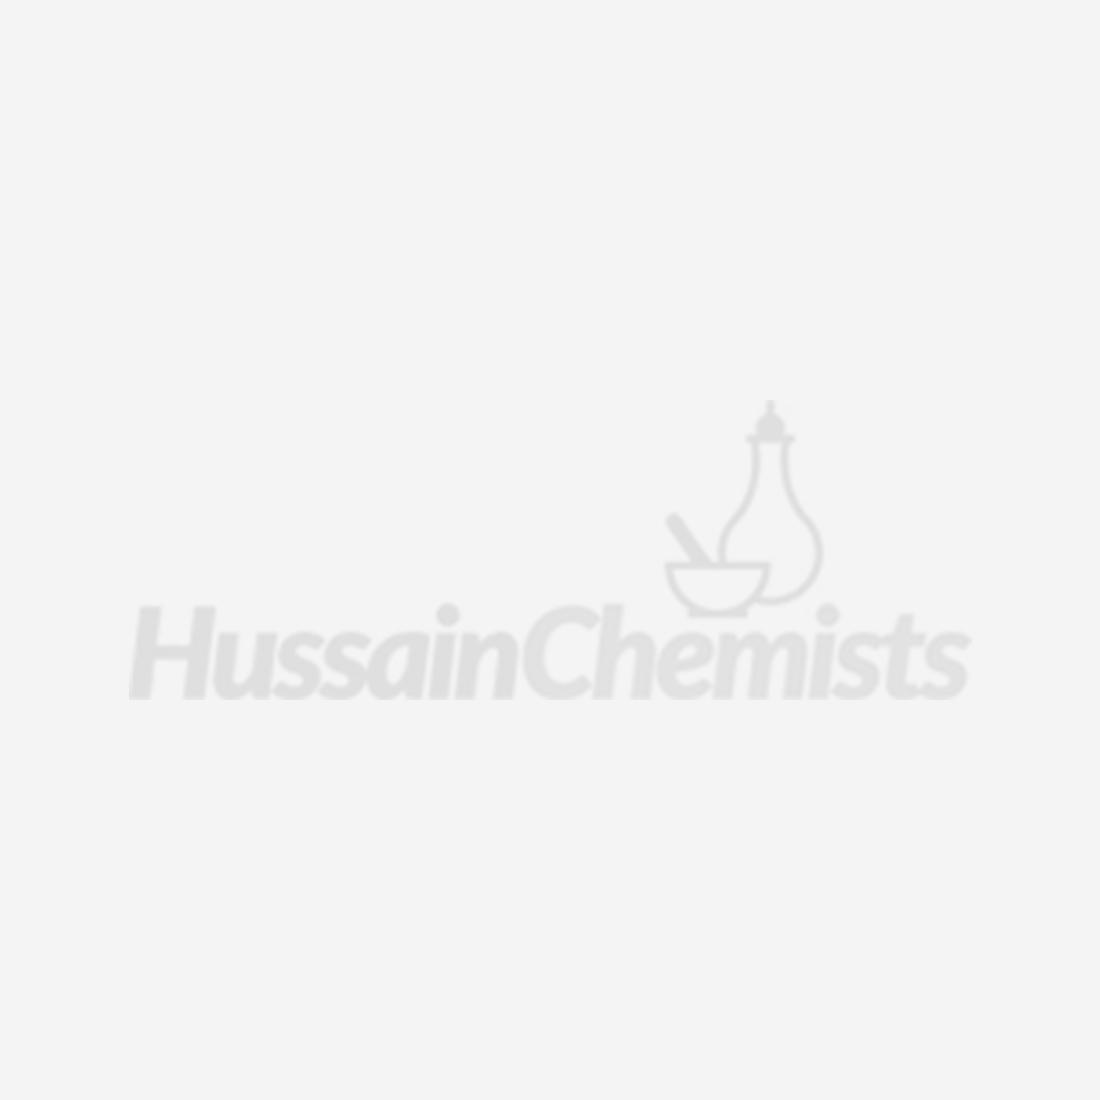 Lyclear Creme Rinse 2 x 59ml